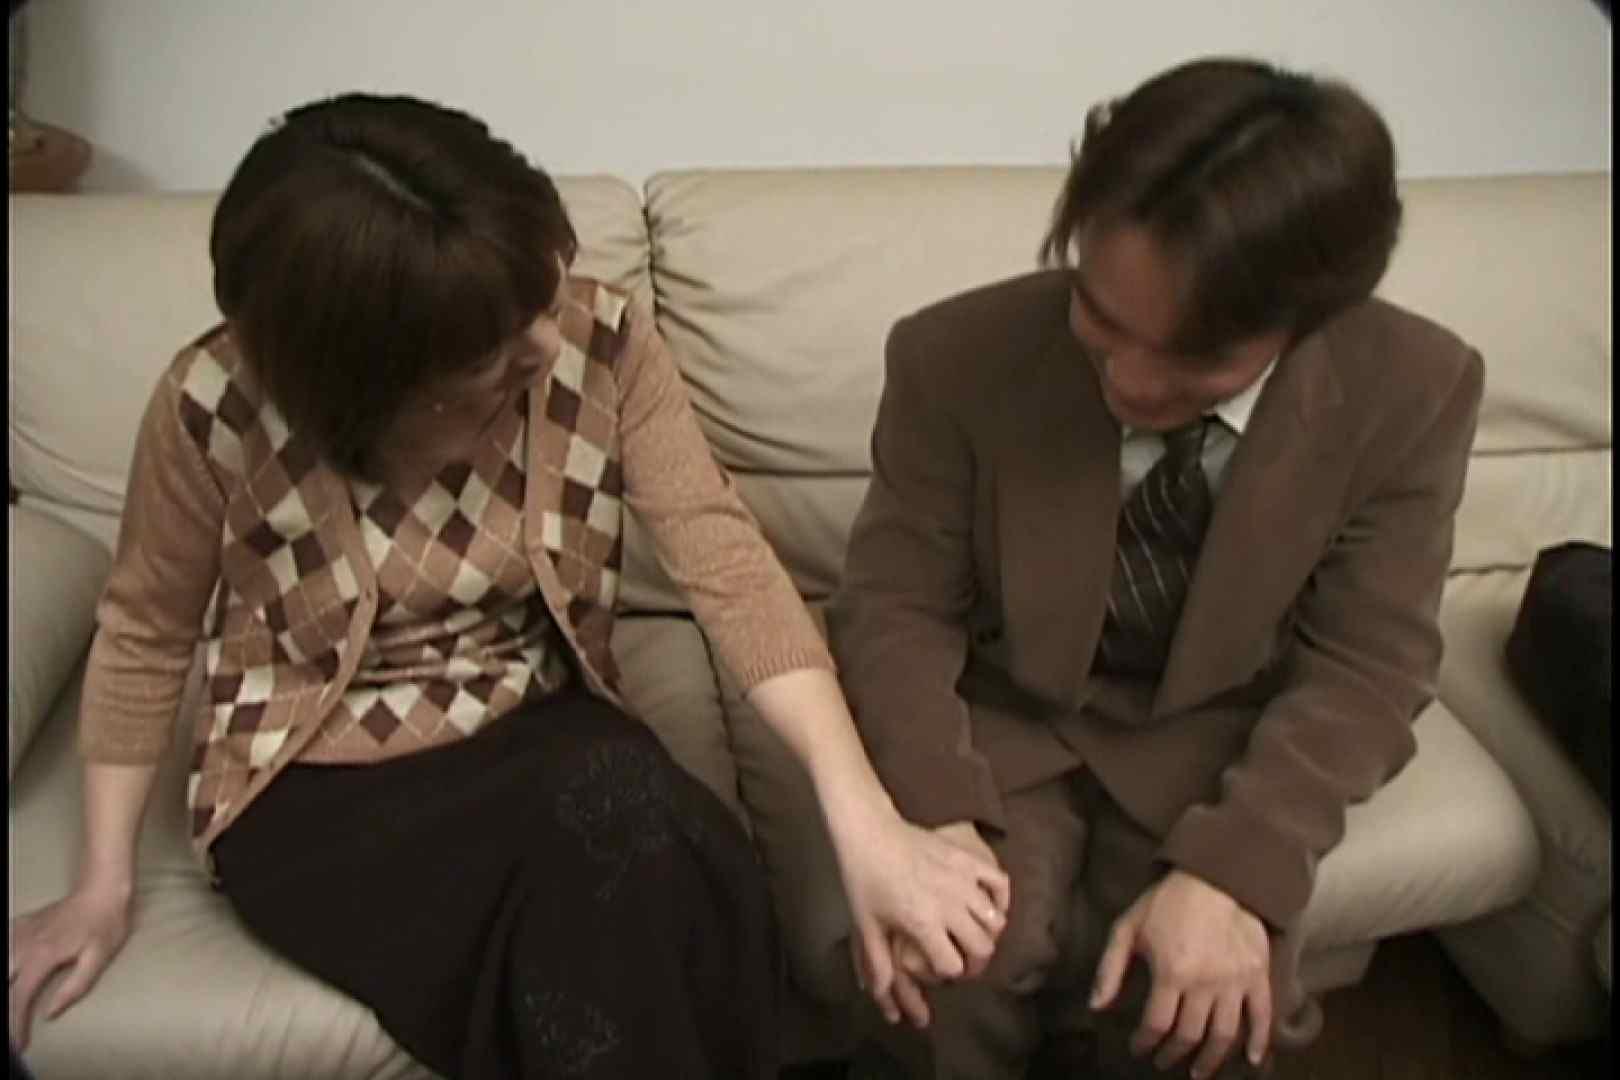 昼間の奥様は欲求不満 ~石川麻紀~ 熟女  111連発 26